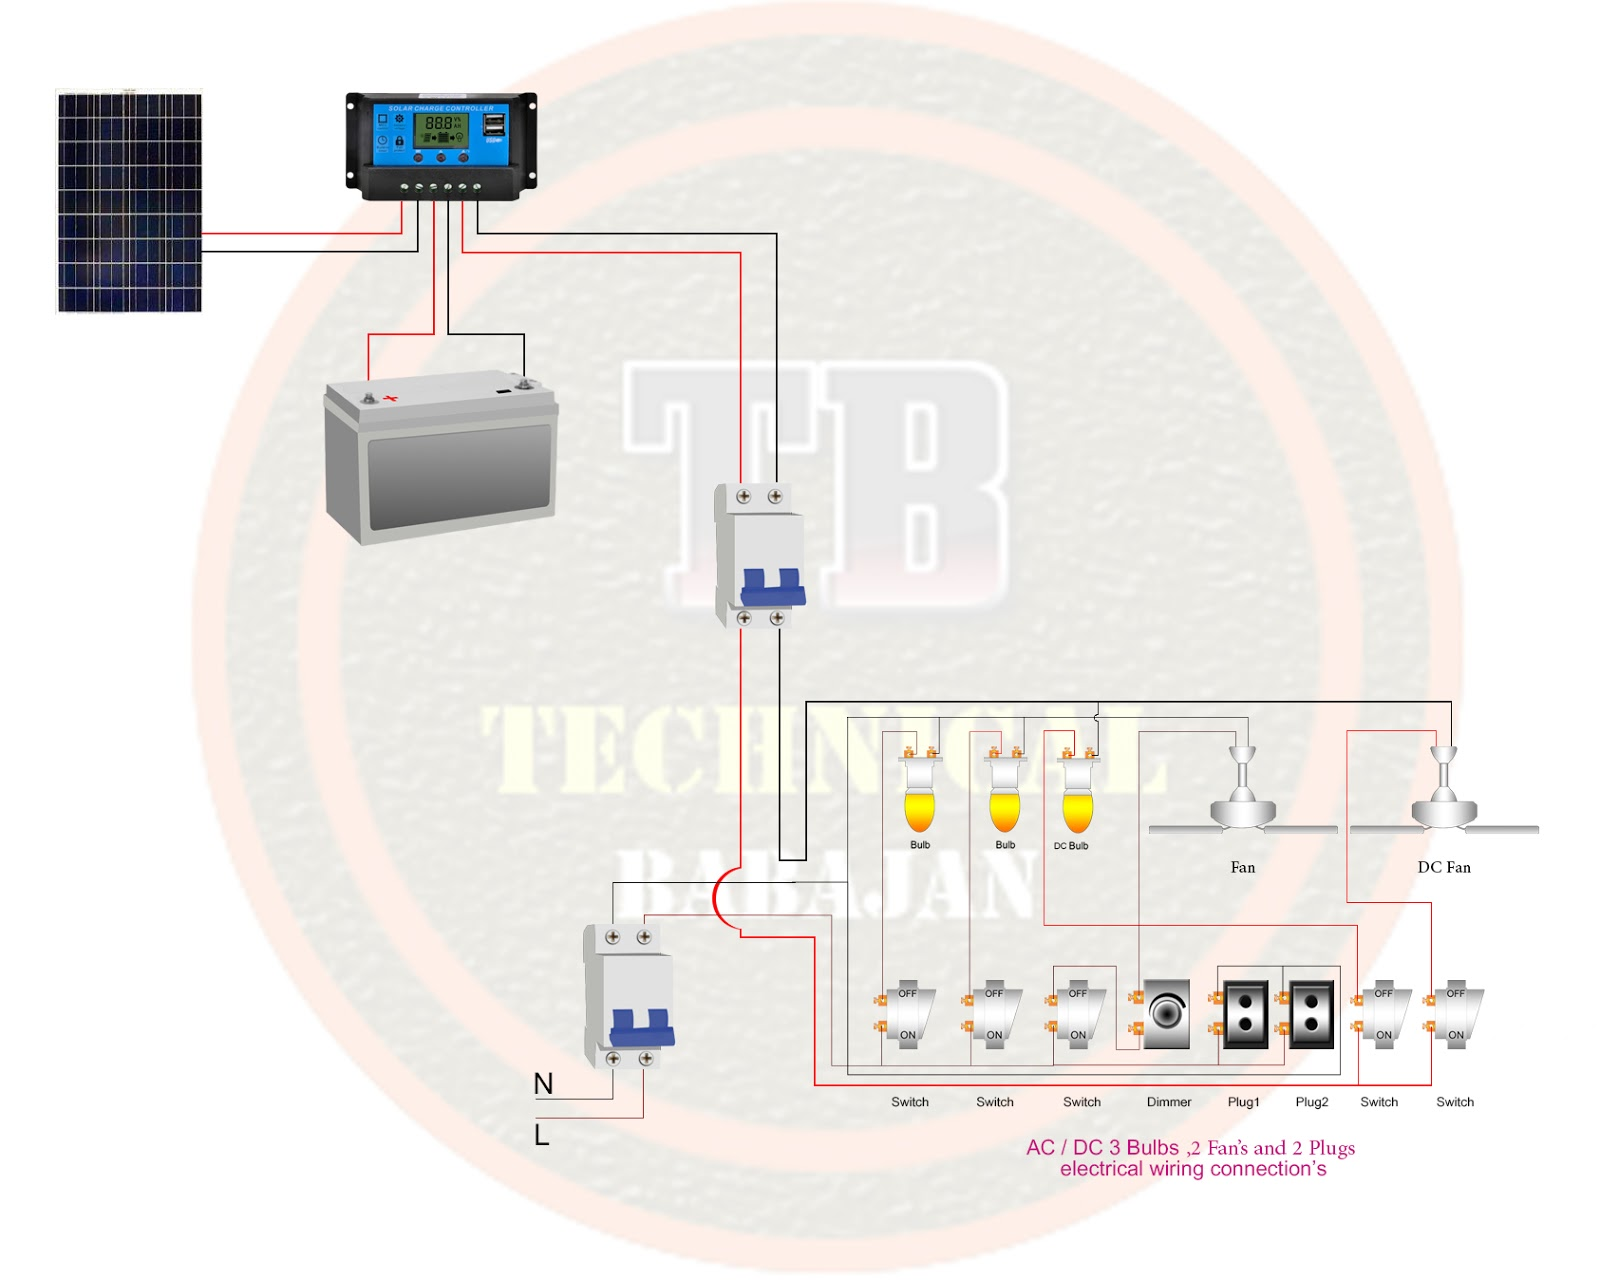 Technica BaBaJan: ac dc electrical wiring diagram on